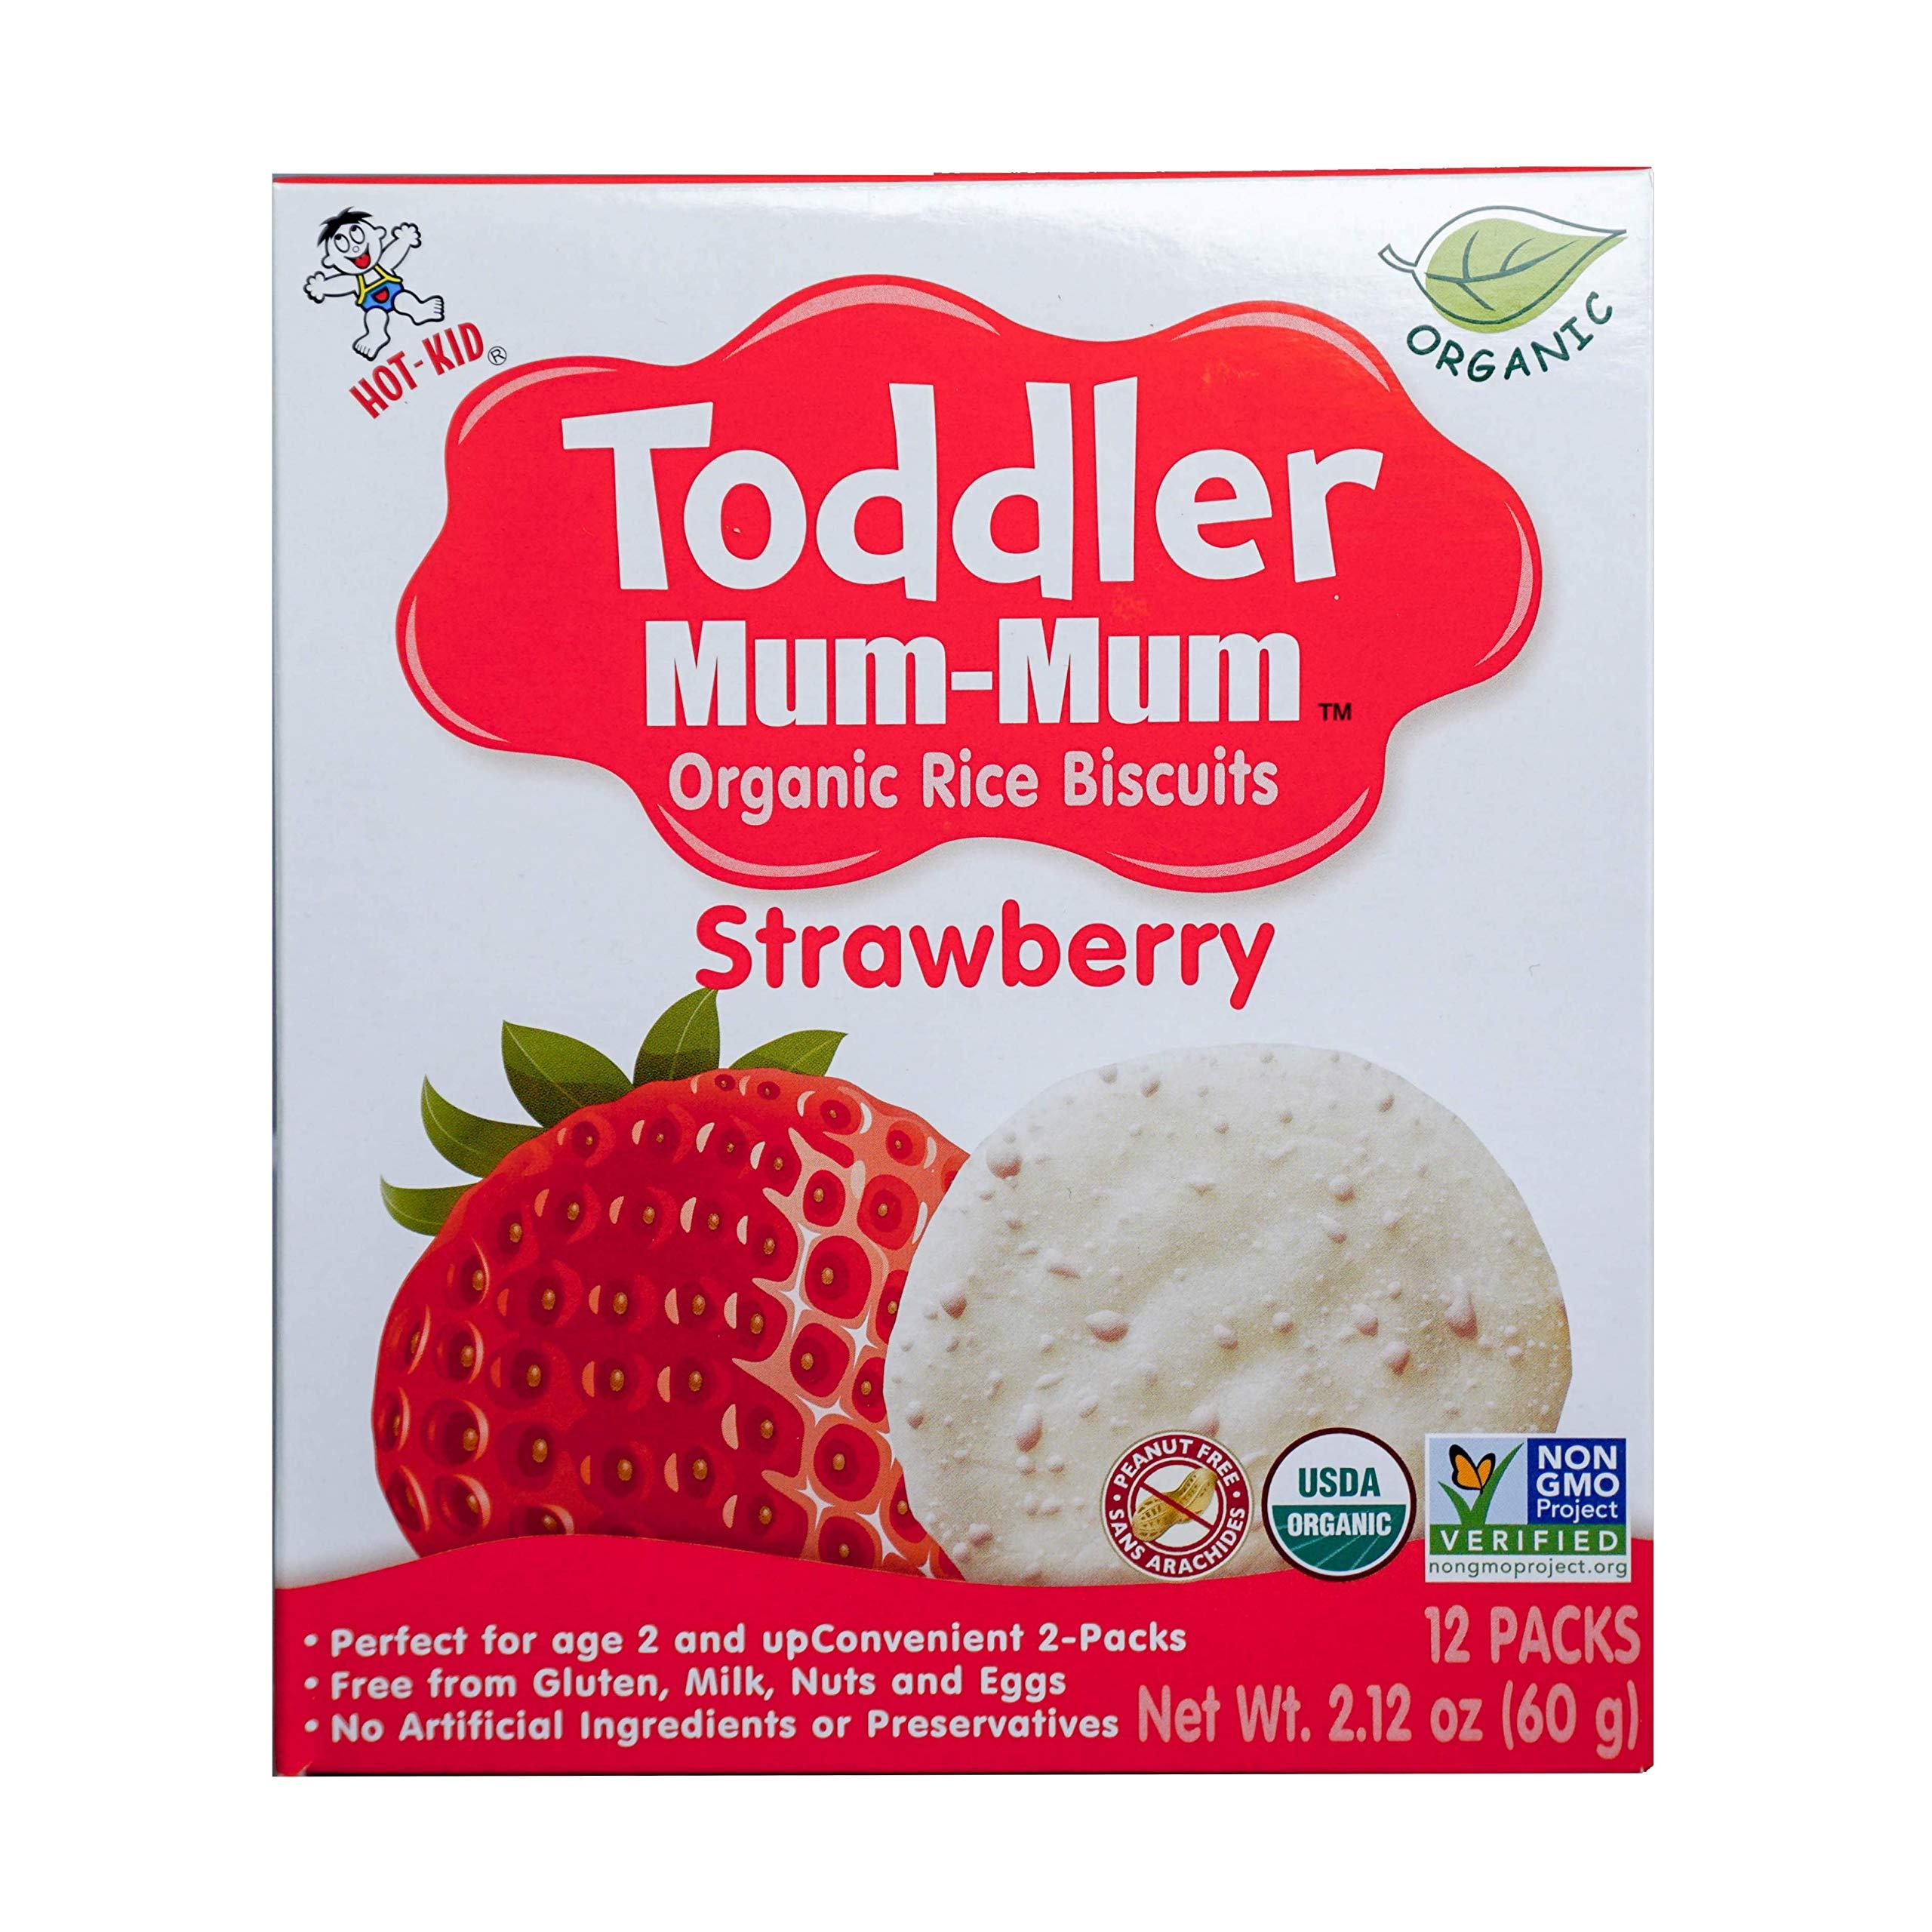 Hot-Kid Toddler Mum-Mum Rice Biscuits, Organic Strawberry, Organic, Gluten Free, Allergen Free, Non-GMO, 2.12 Ounce,12 Count, Pack of 6 by Baby Mum-Mum